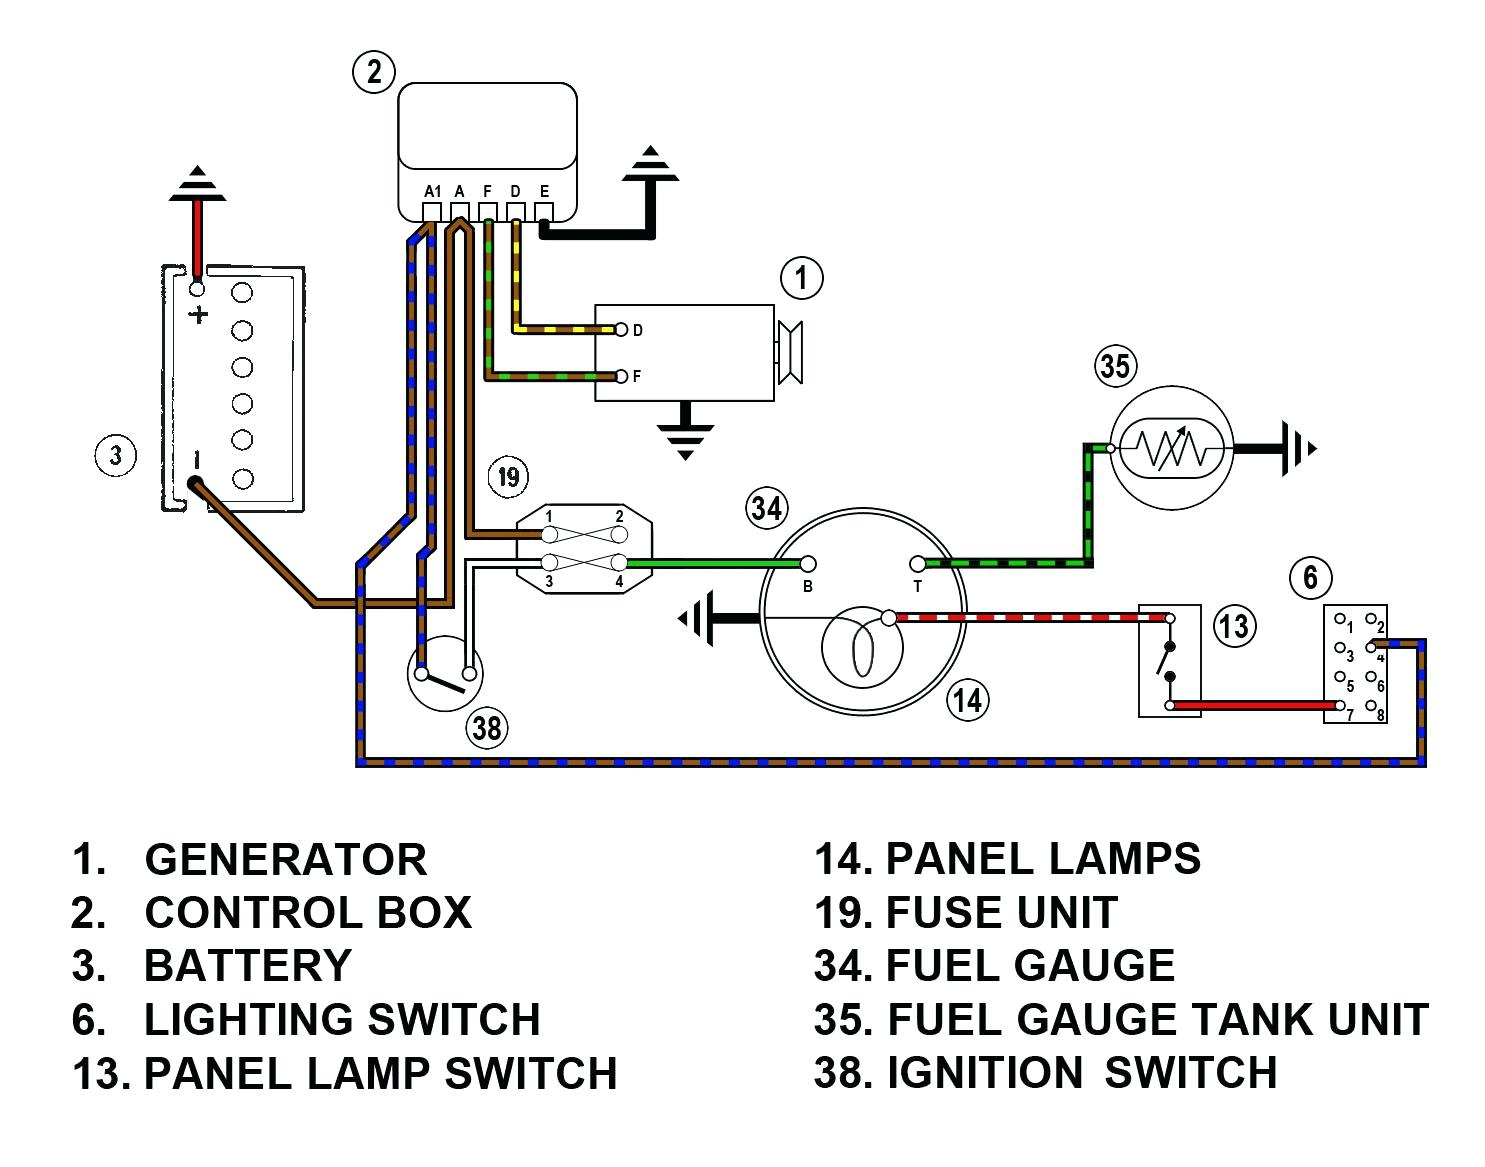 dump trailer pump wiring diagram Collection-hawke dump trailer wiring diagram Collection gooseneck wiring diagram Download Gooseneck Trailer Wiring Diagram Elegant DOWNLOAD Wiring Diagram 12-l